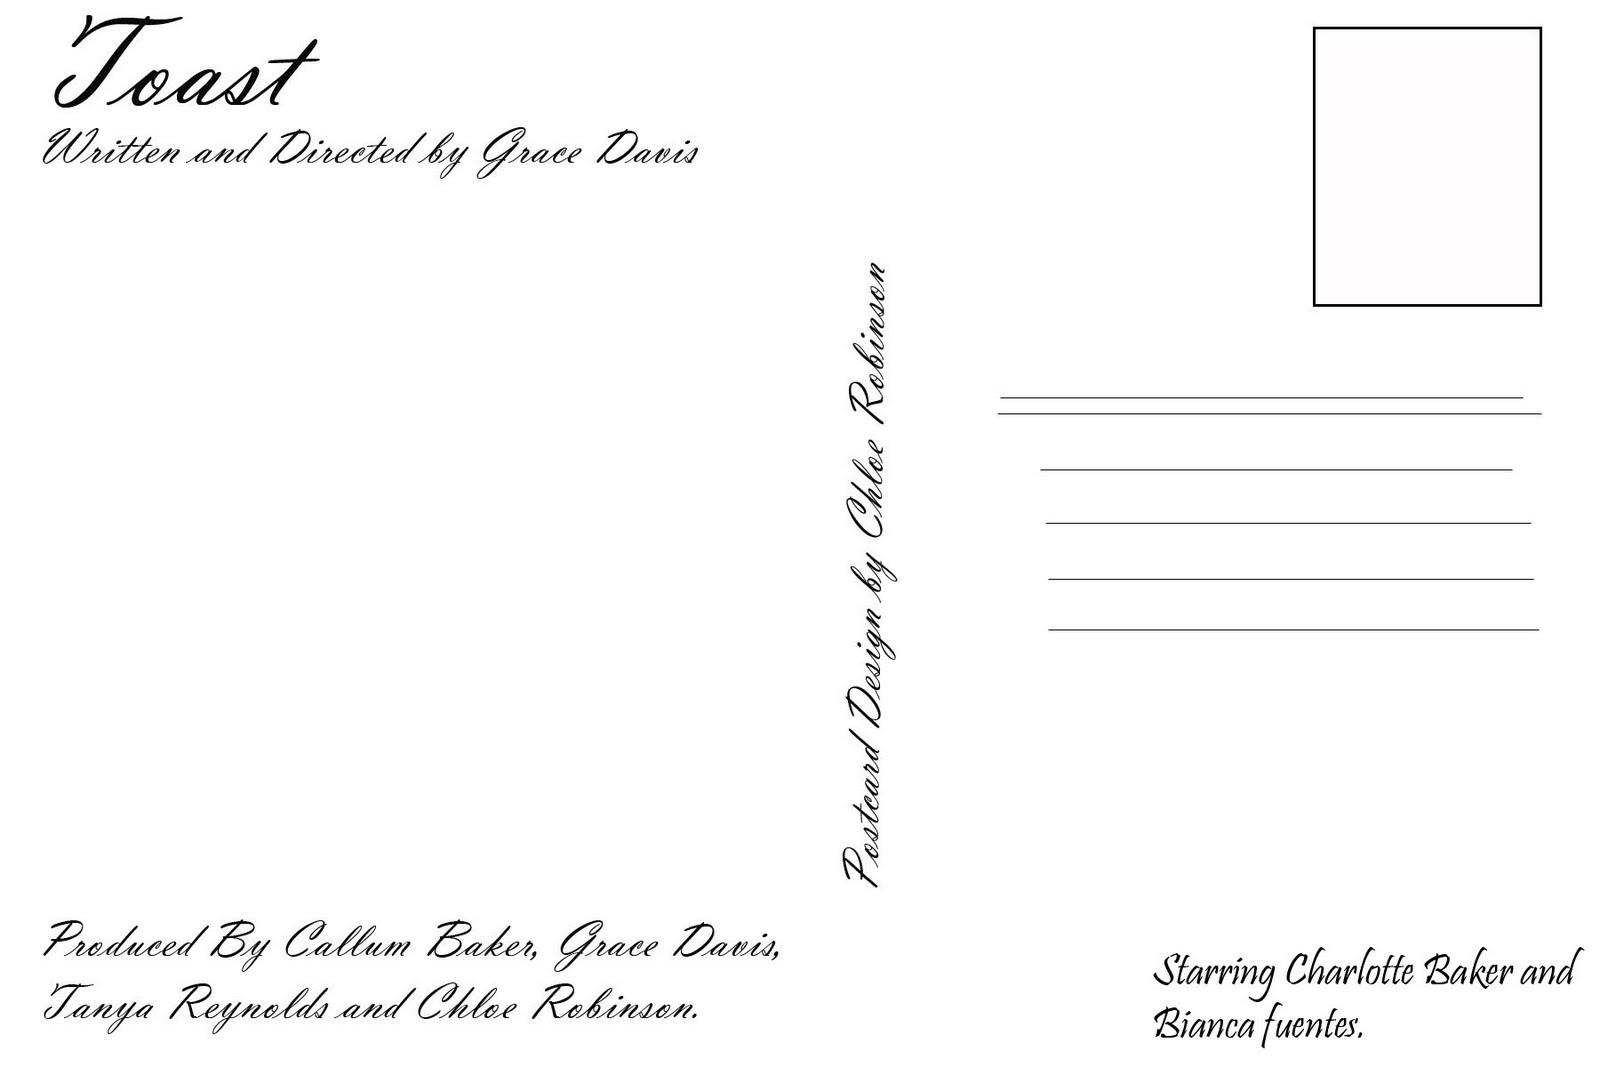 http://3.bp.blogspot.com/_CIG9QpeBUgU/S9rndpkswNI/AAAAAAAAAWw/TT-ke6dRTFk/s1600/back+of+postcard.jpg